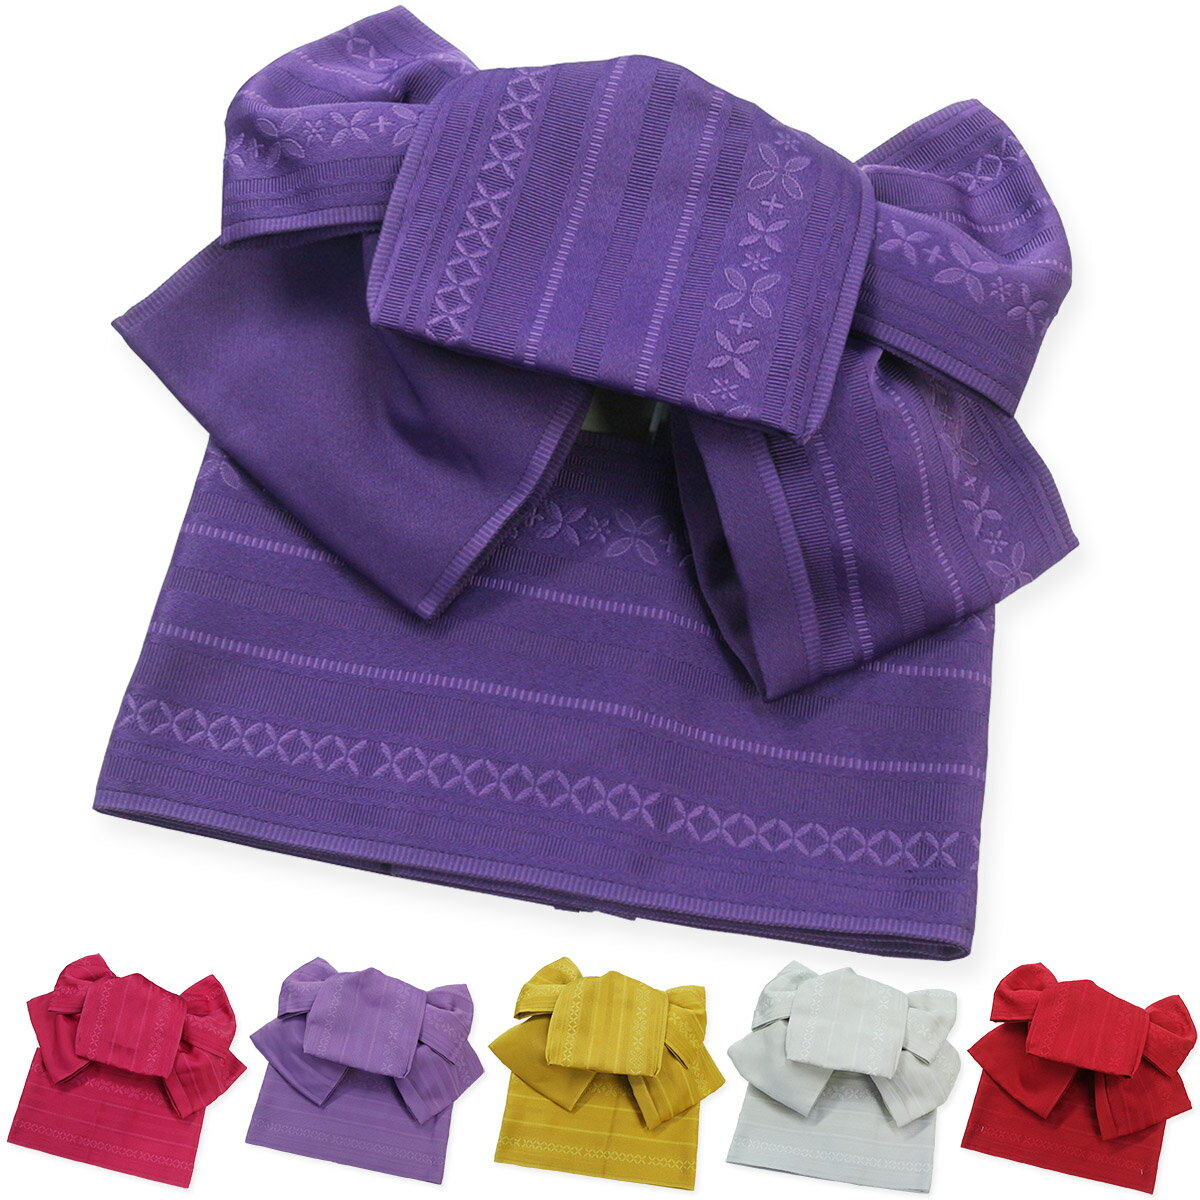 作り帯 七宝献上浴衣帯 両面小袋半幅帯 つばめ結び帯 送料無料